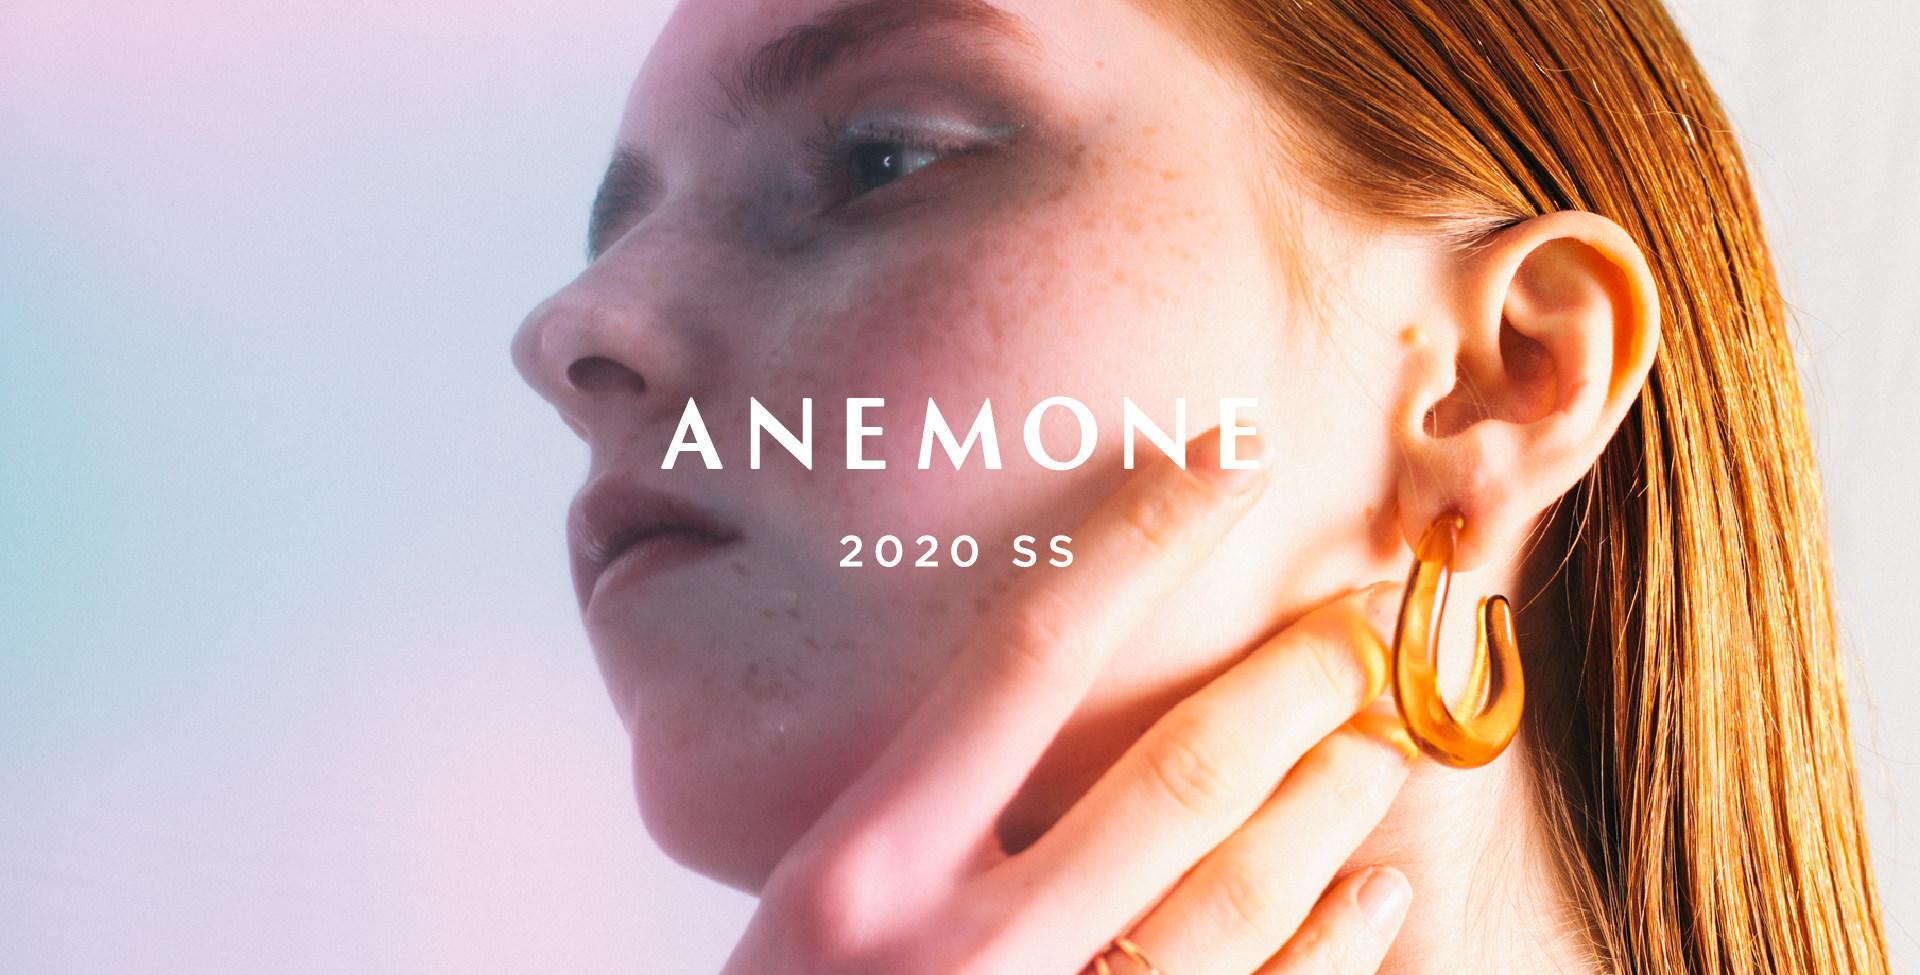 ANEMONE 2020 SS Jun